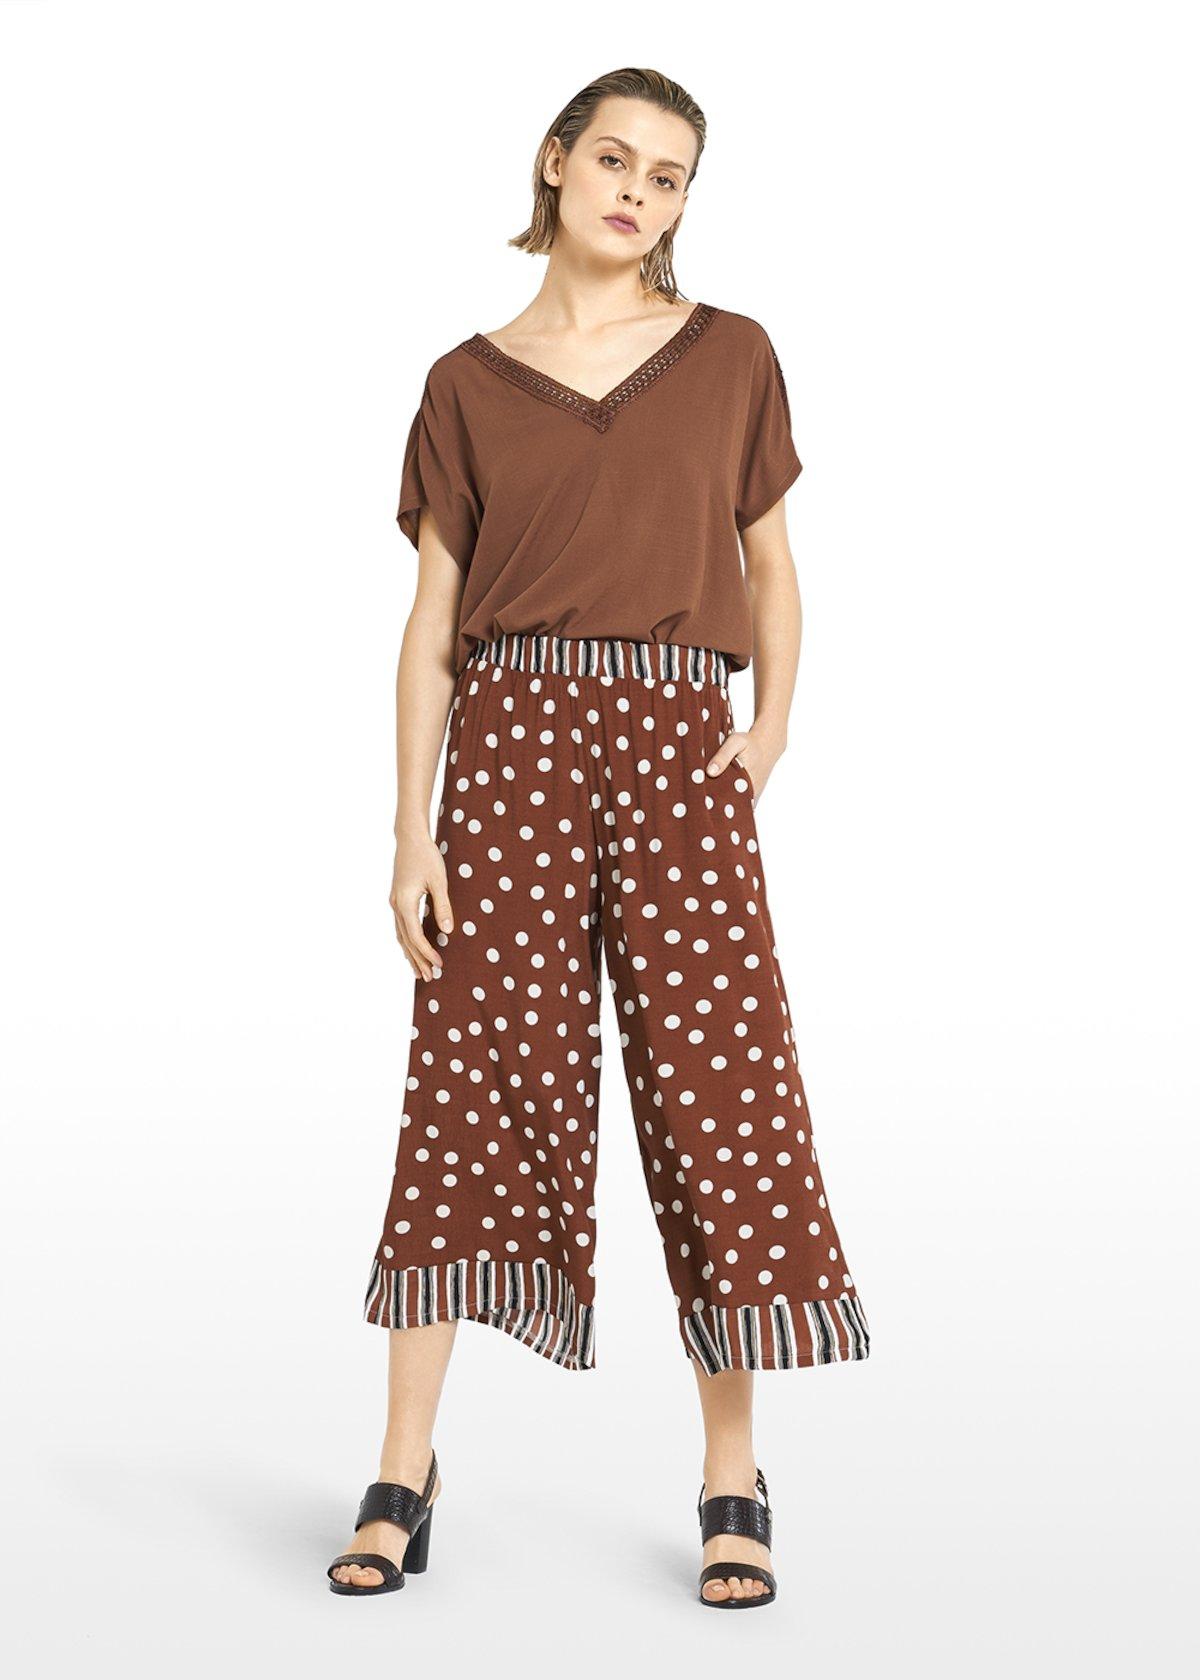 Paly capri pants  Megan design with stripes & pois fantasy